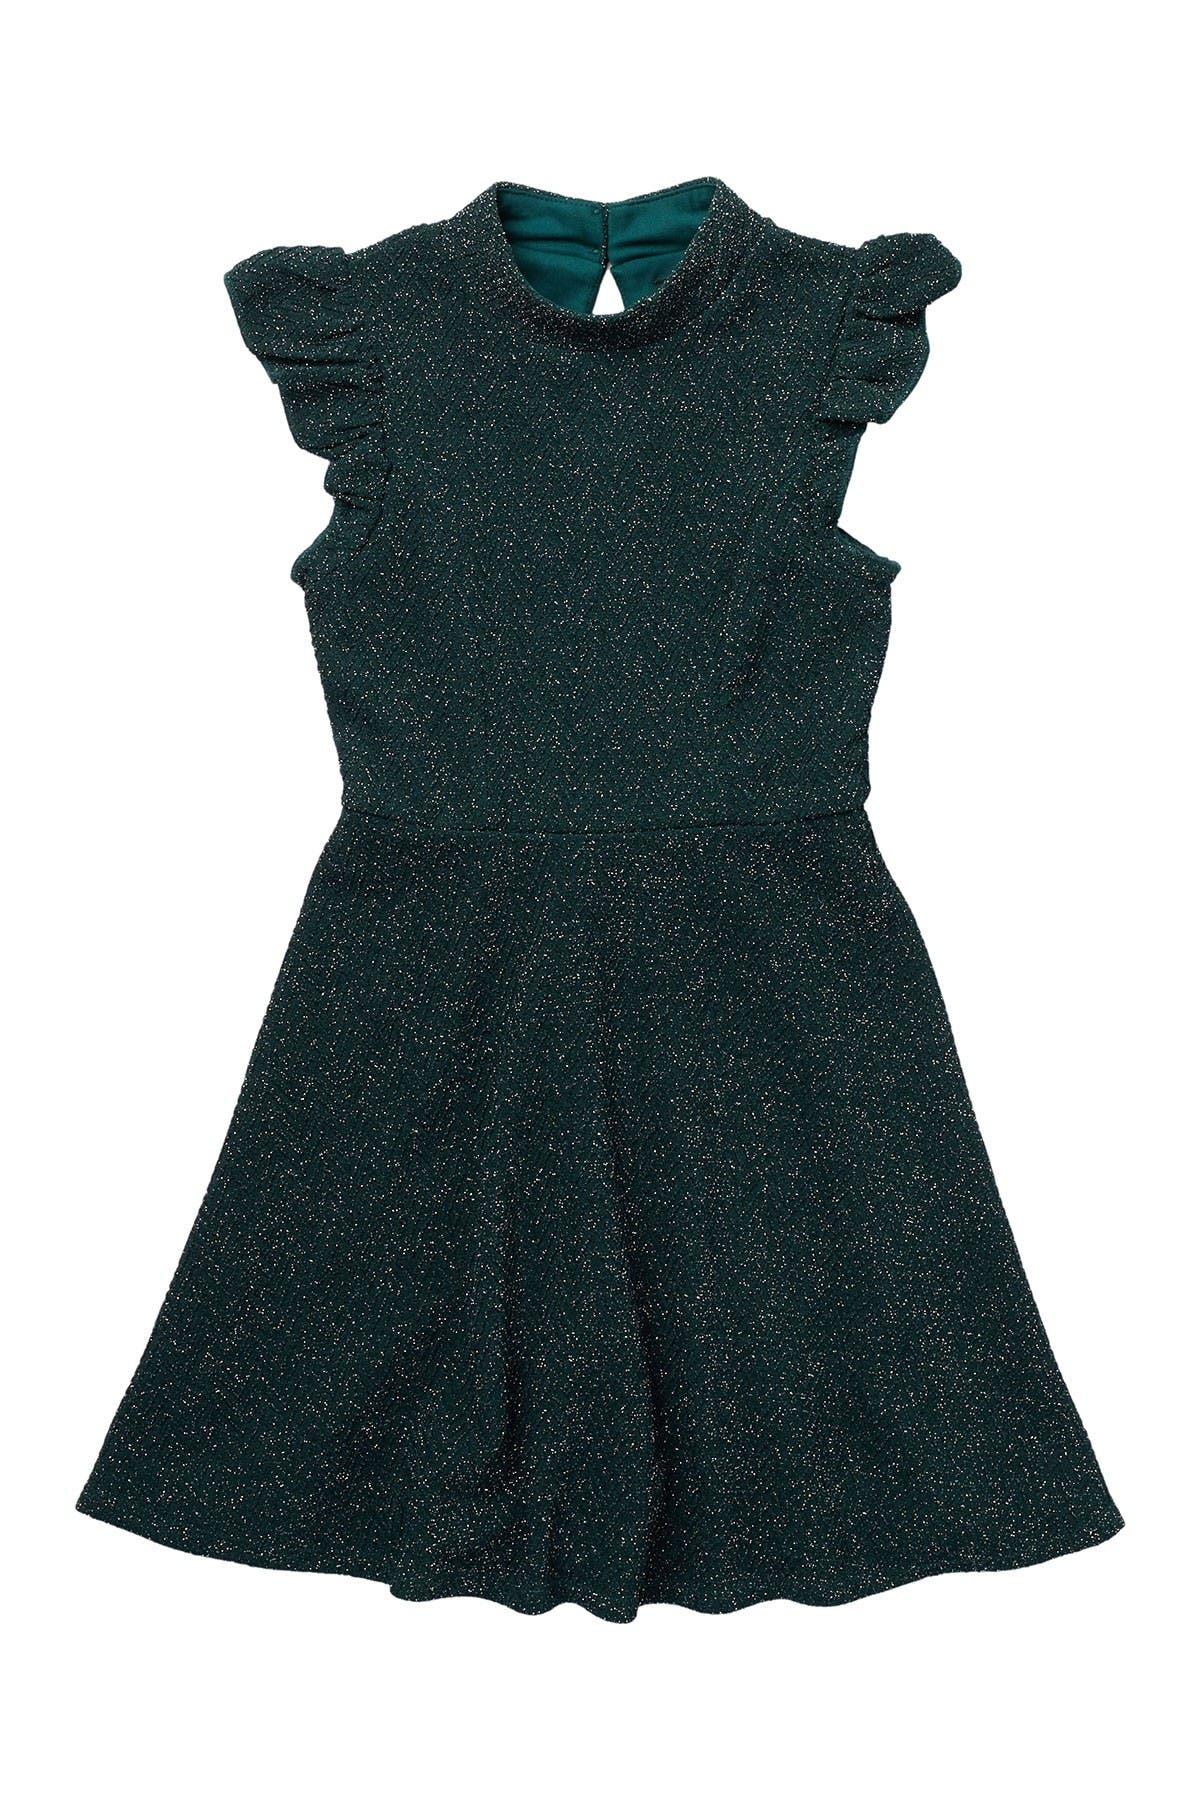 Image of Zunie Ruffle Sleeve Mock Neck Dress